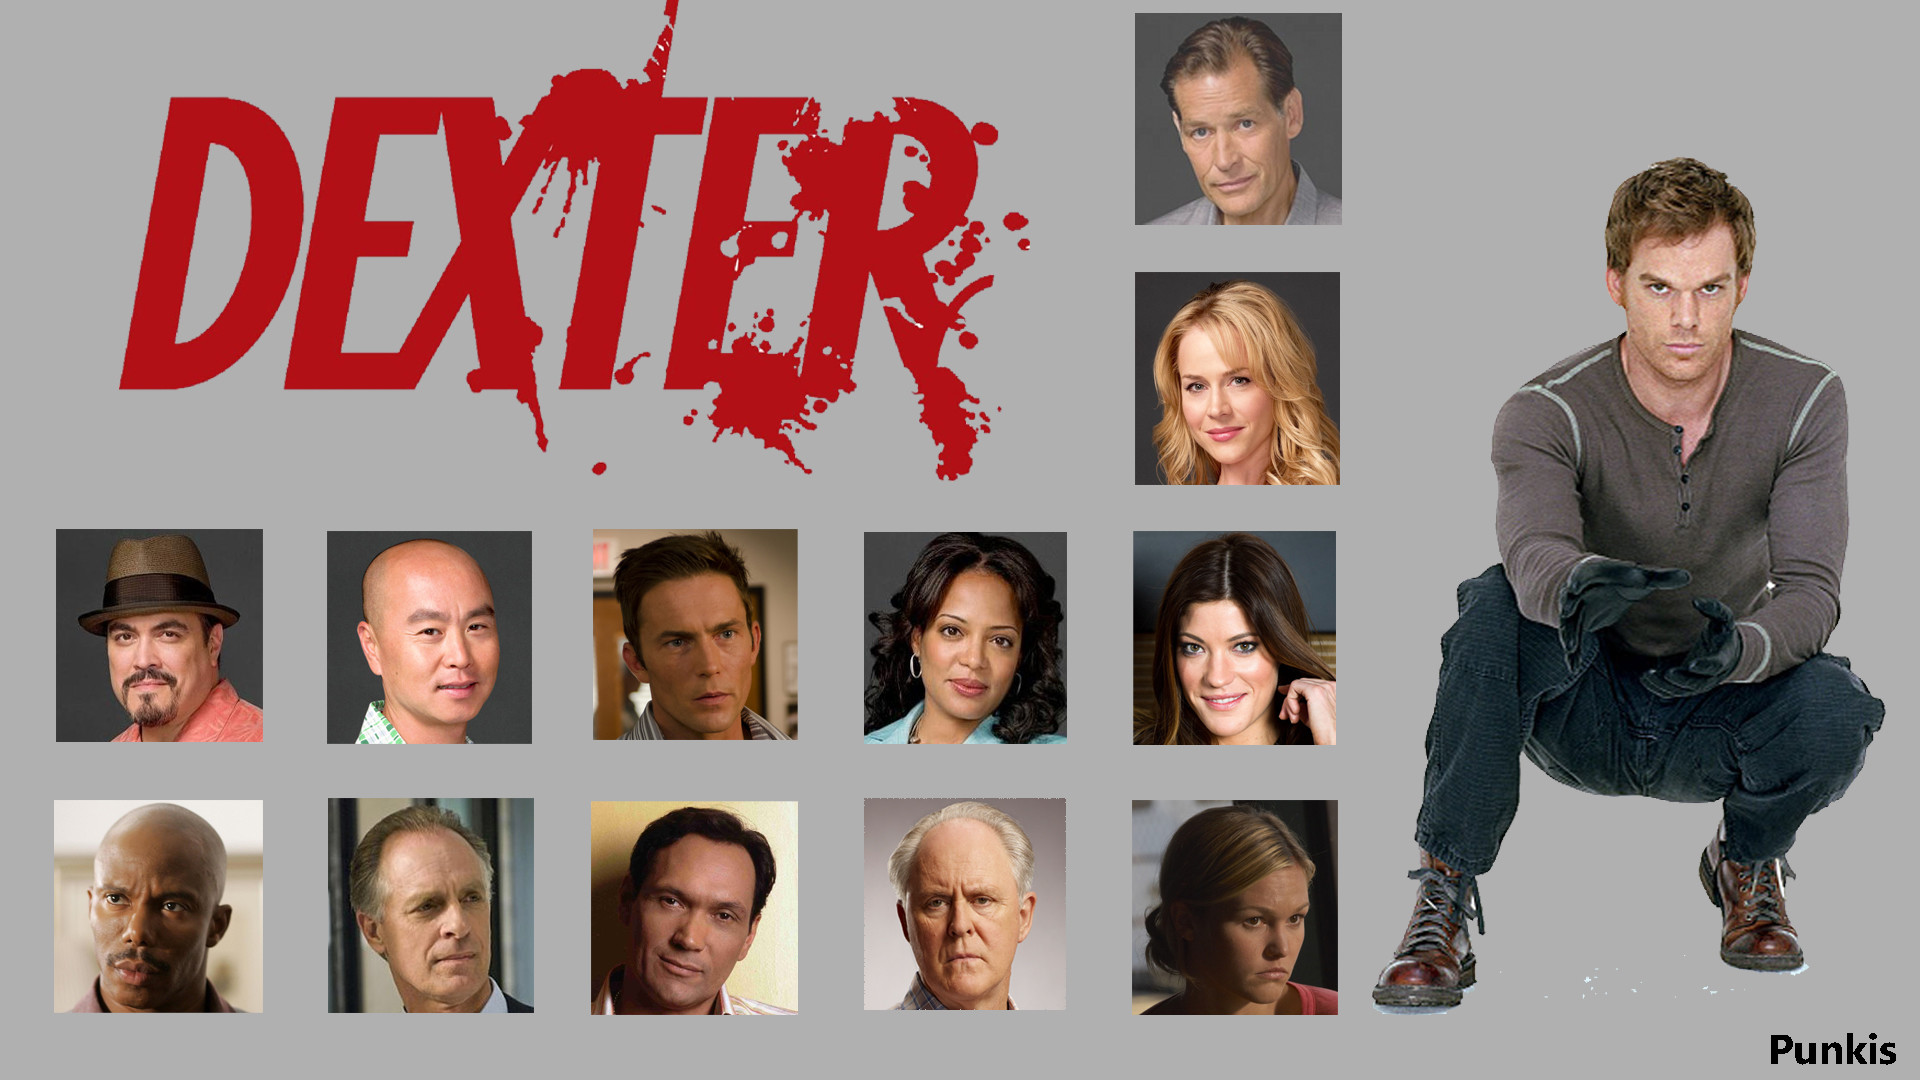 … Dexter All Starz HD 1080p Wallpaper by ThePunkis23